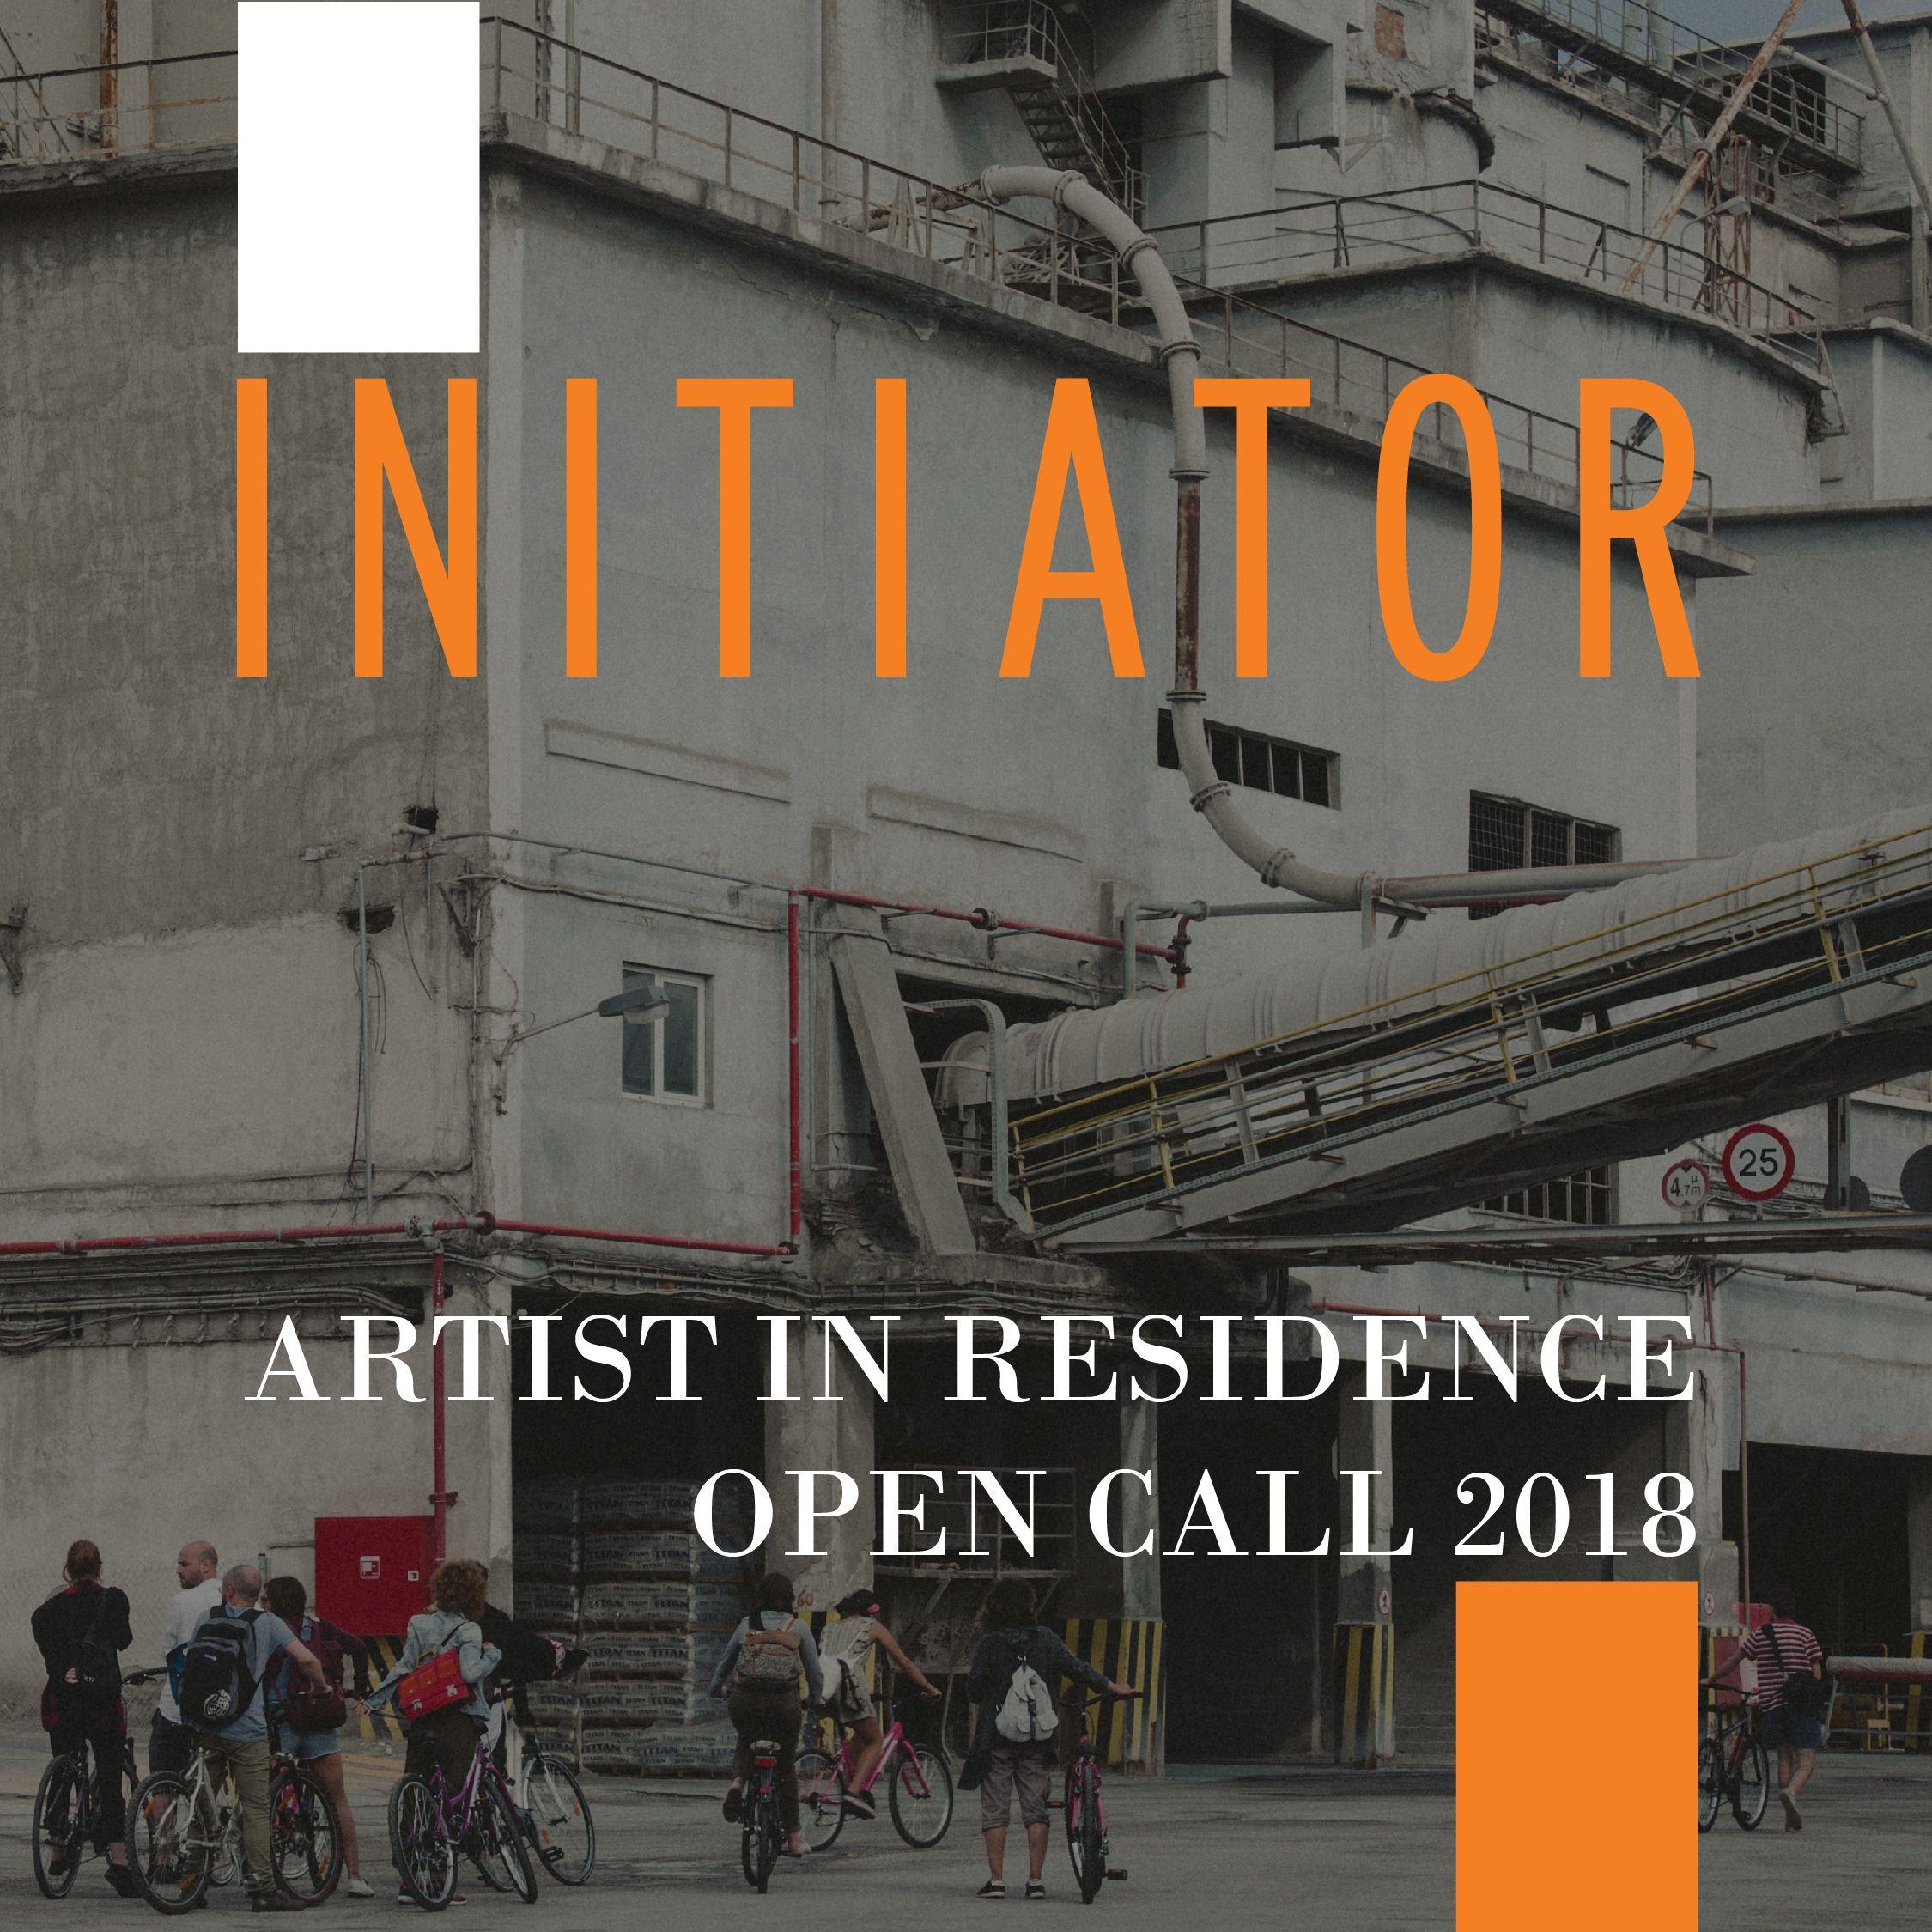 Initiator artistinresidence programme eleusis 2021